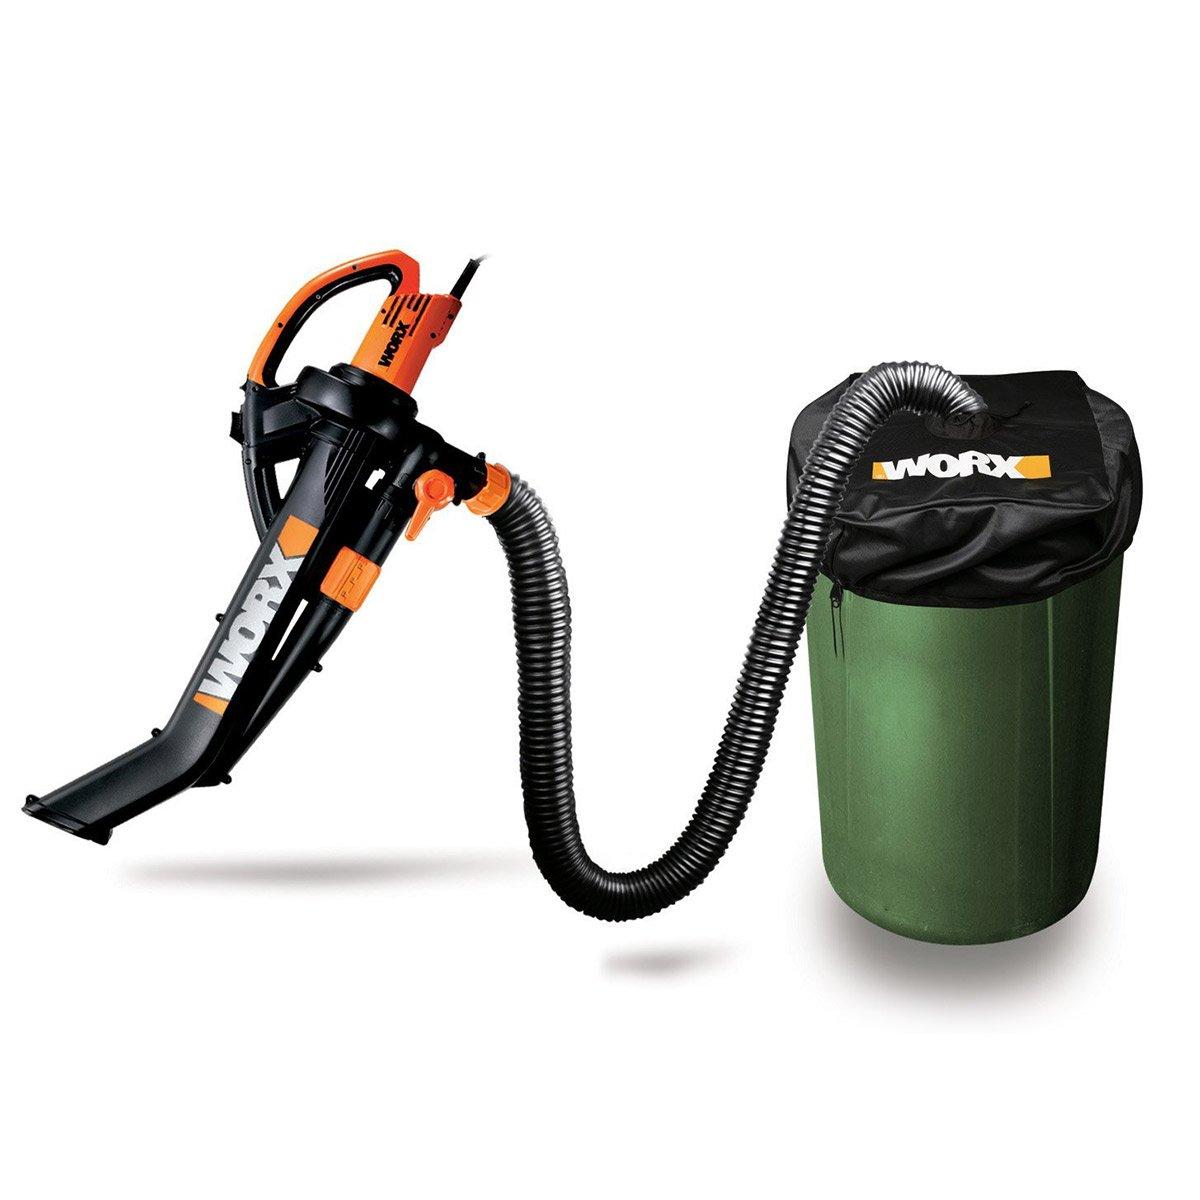 Best Leaf Blower Vacuum Mulcher : Worx trivac blower mulcher yard vacuum with leaf